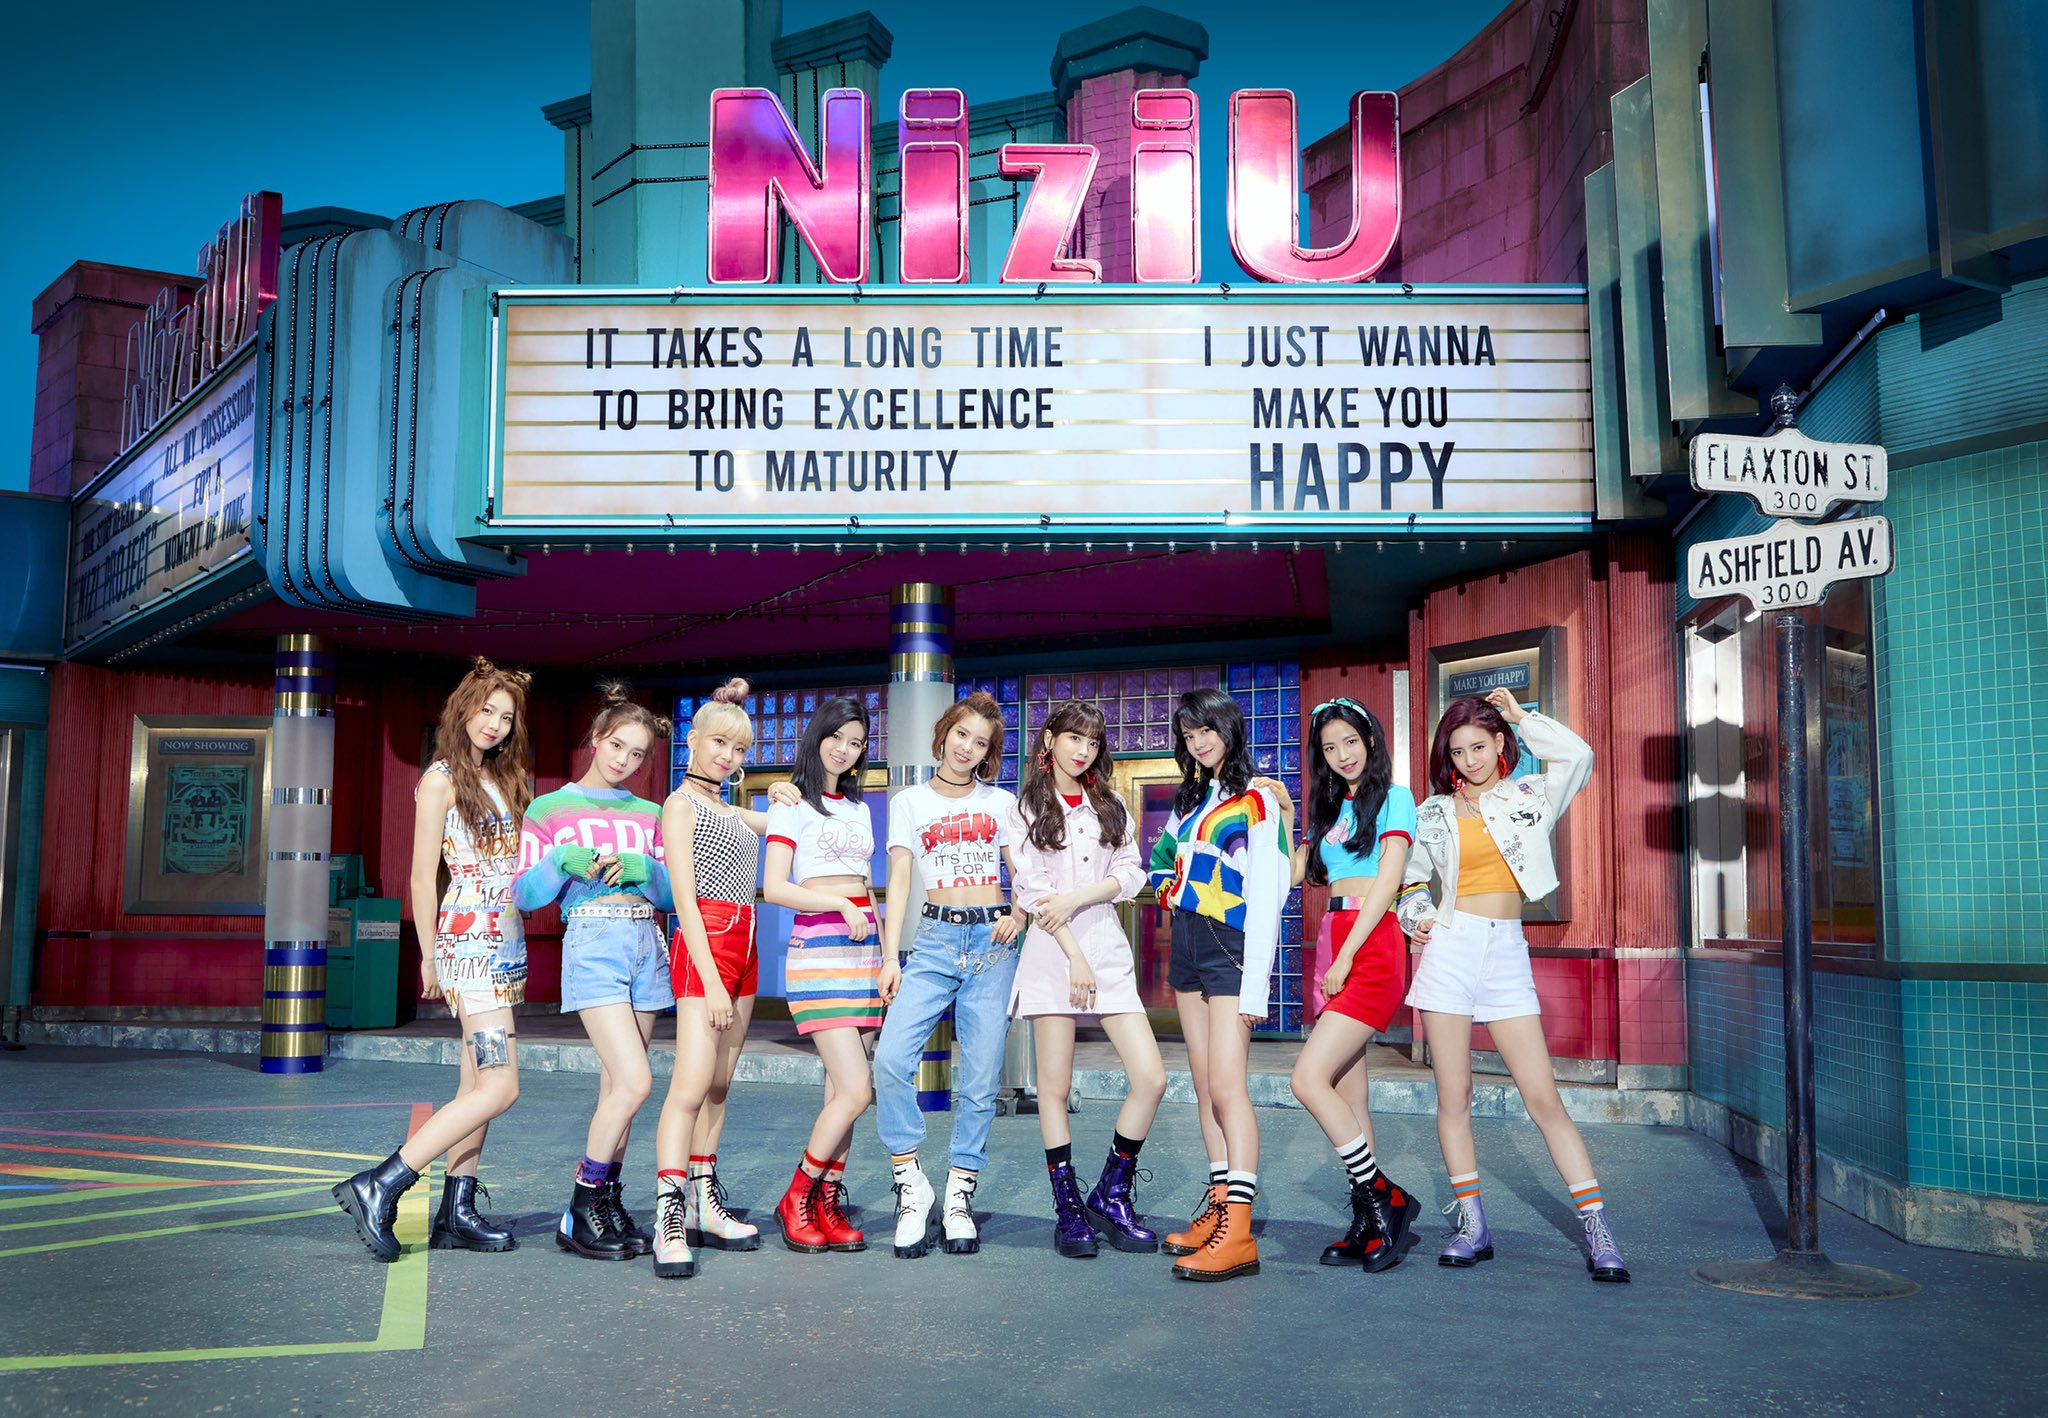 『Nizi Project』発「NiziU」のメンバー9人決定!に関する画像